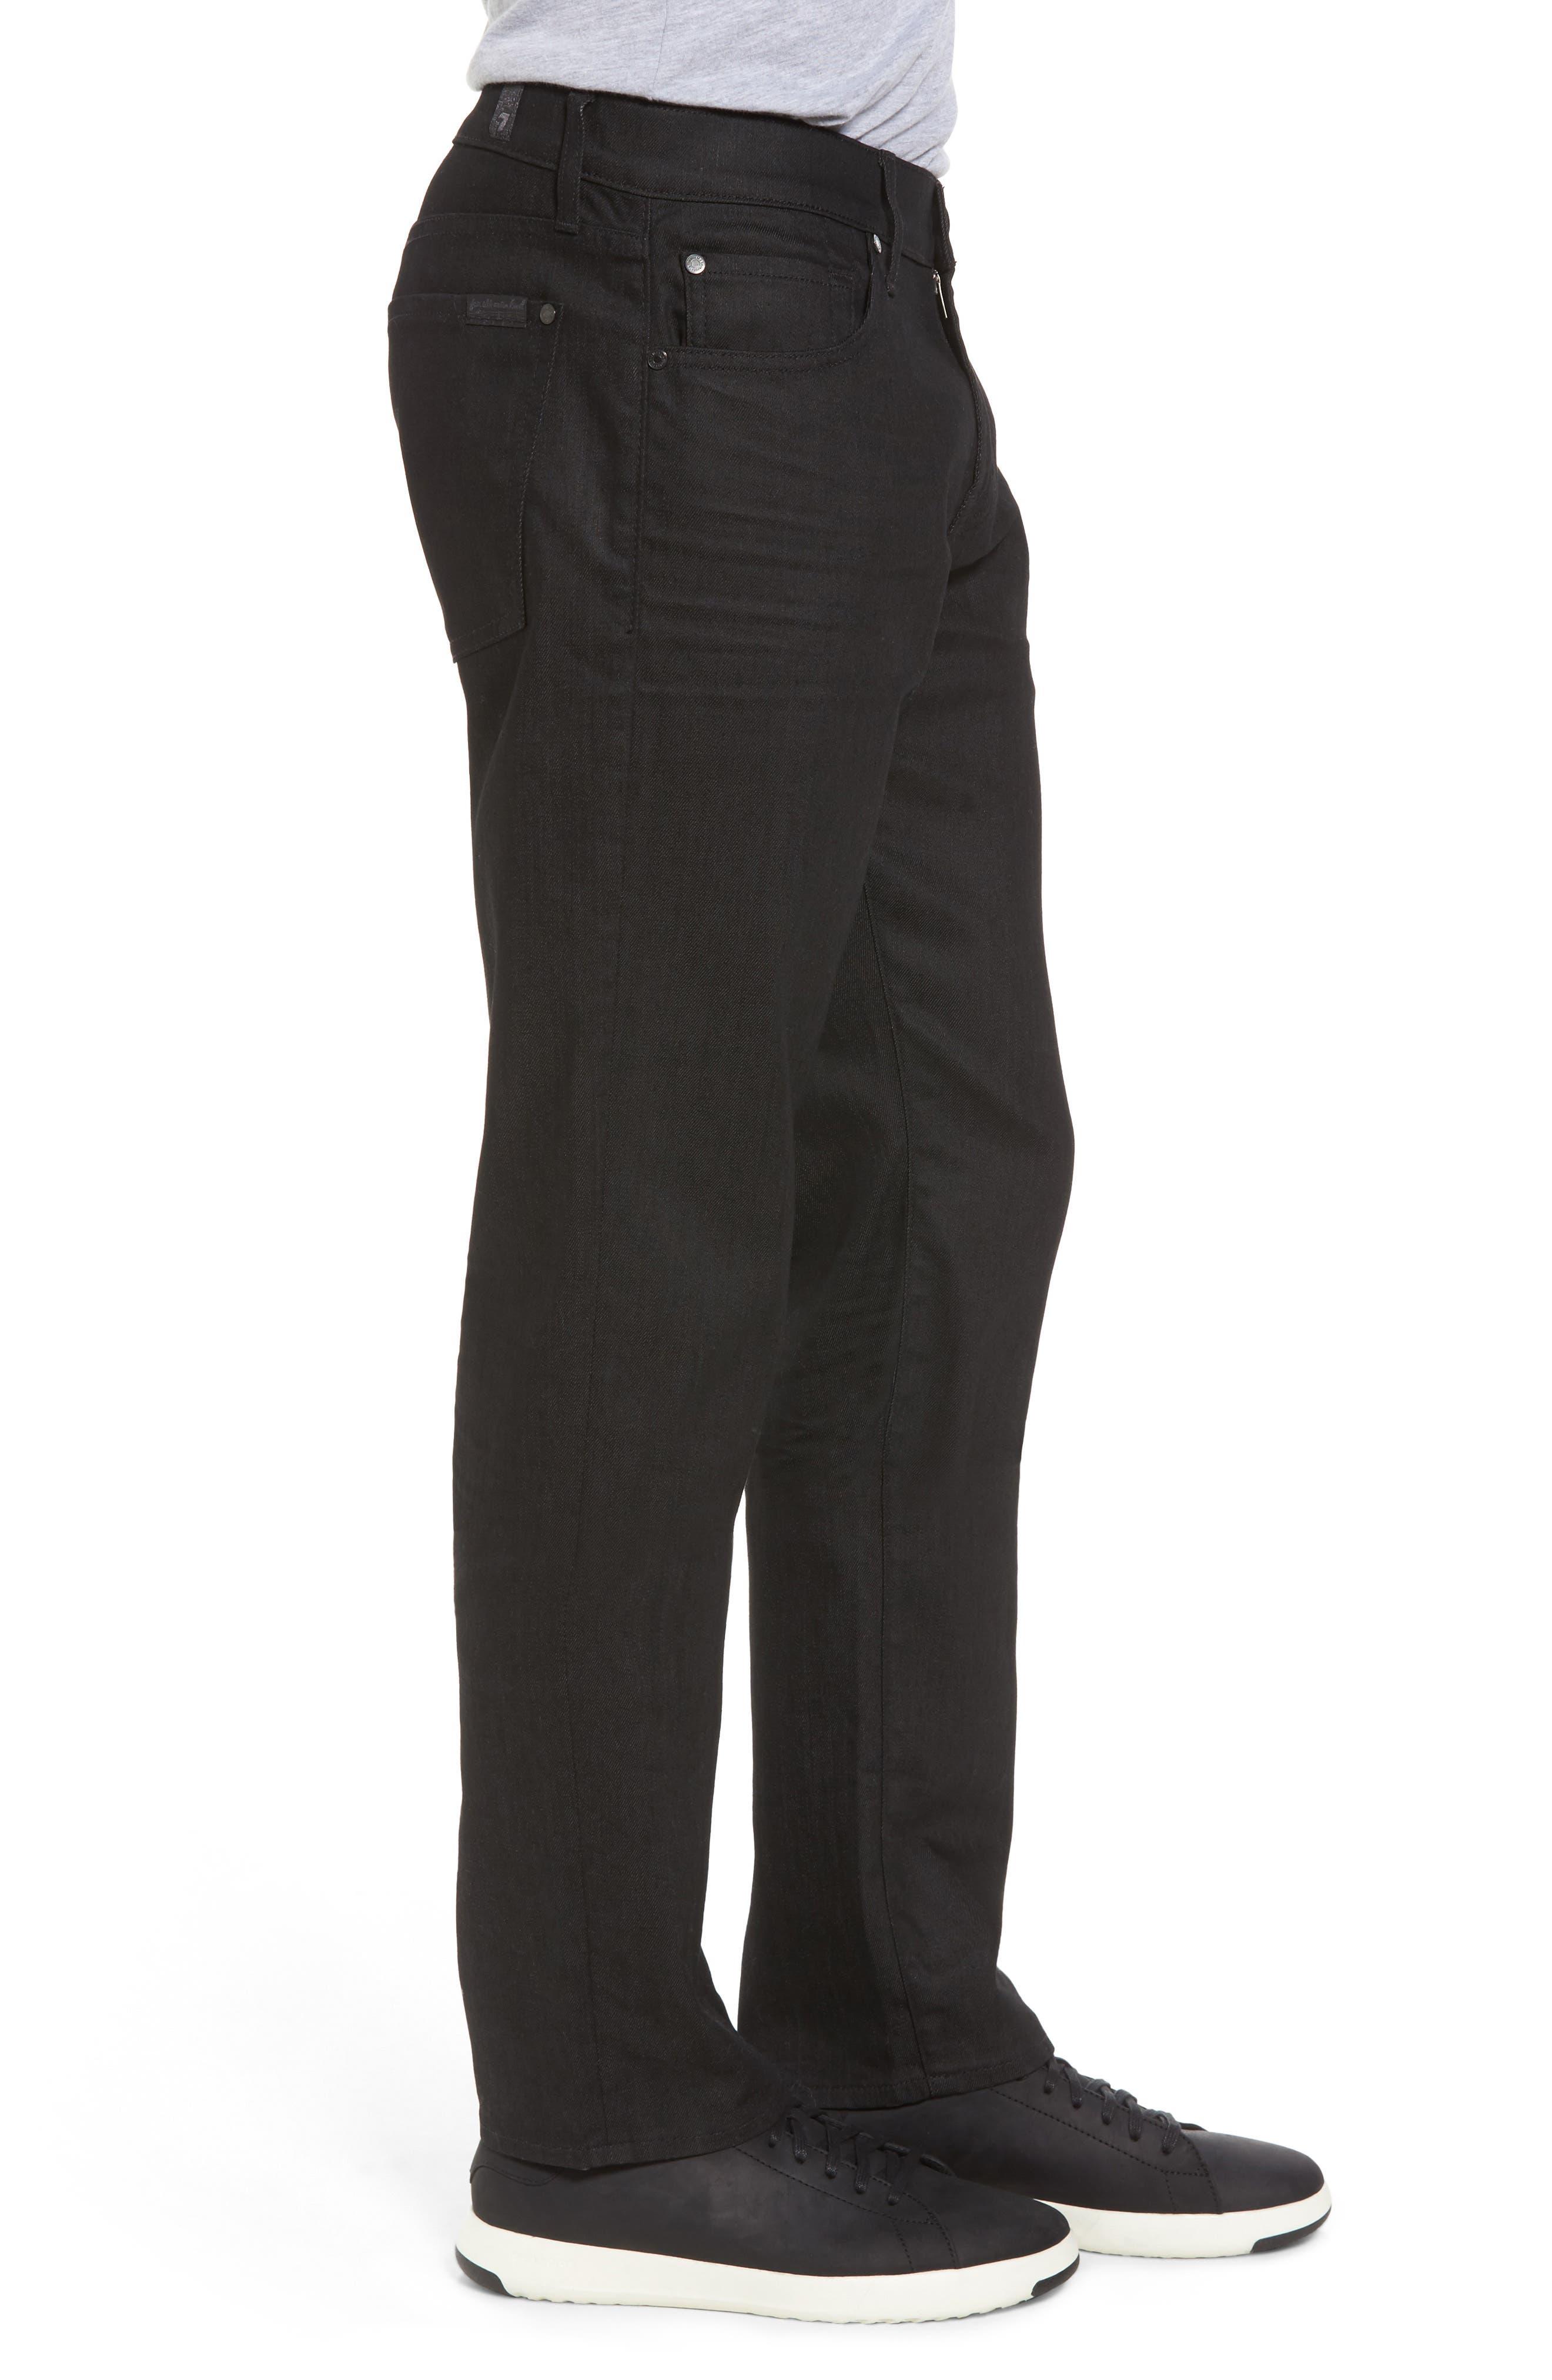 Alternate Image 3  - 7 For All Mankind® Airweft - Slimmy Slim Fit Jeans (Soiree Black)